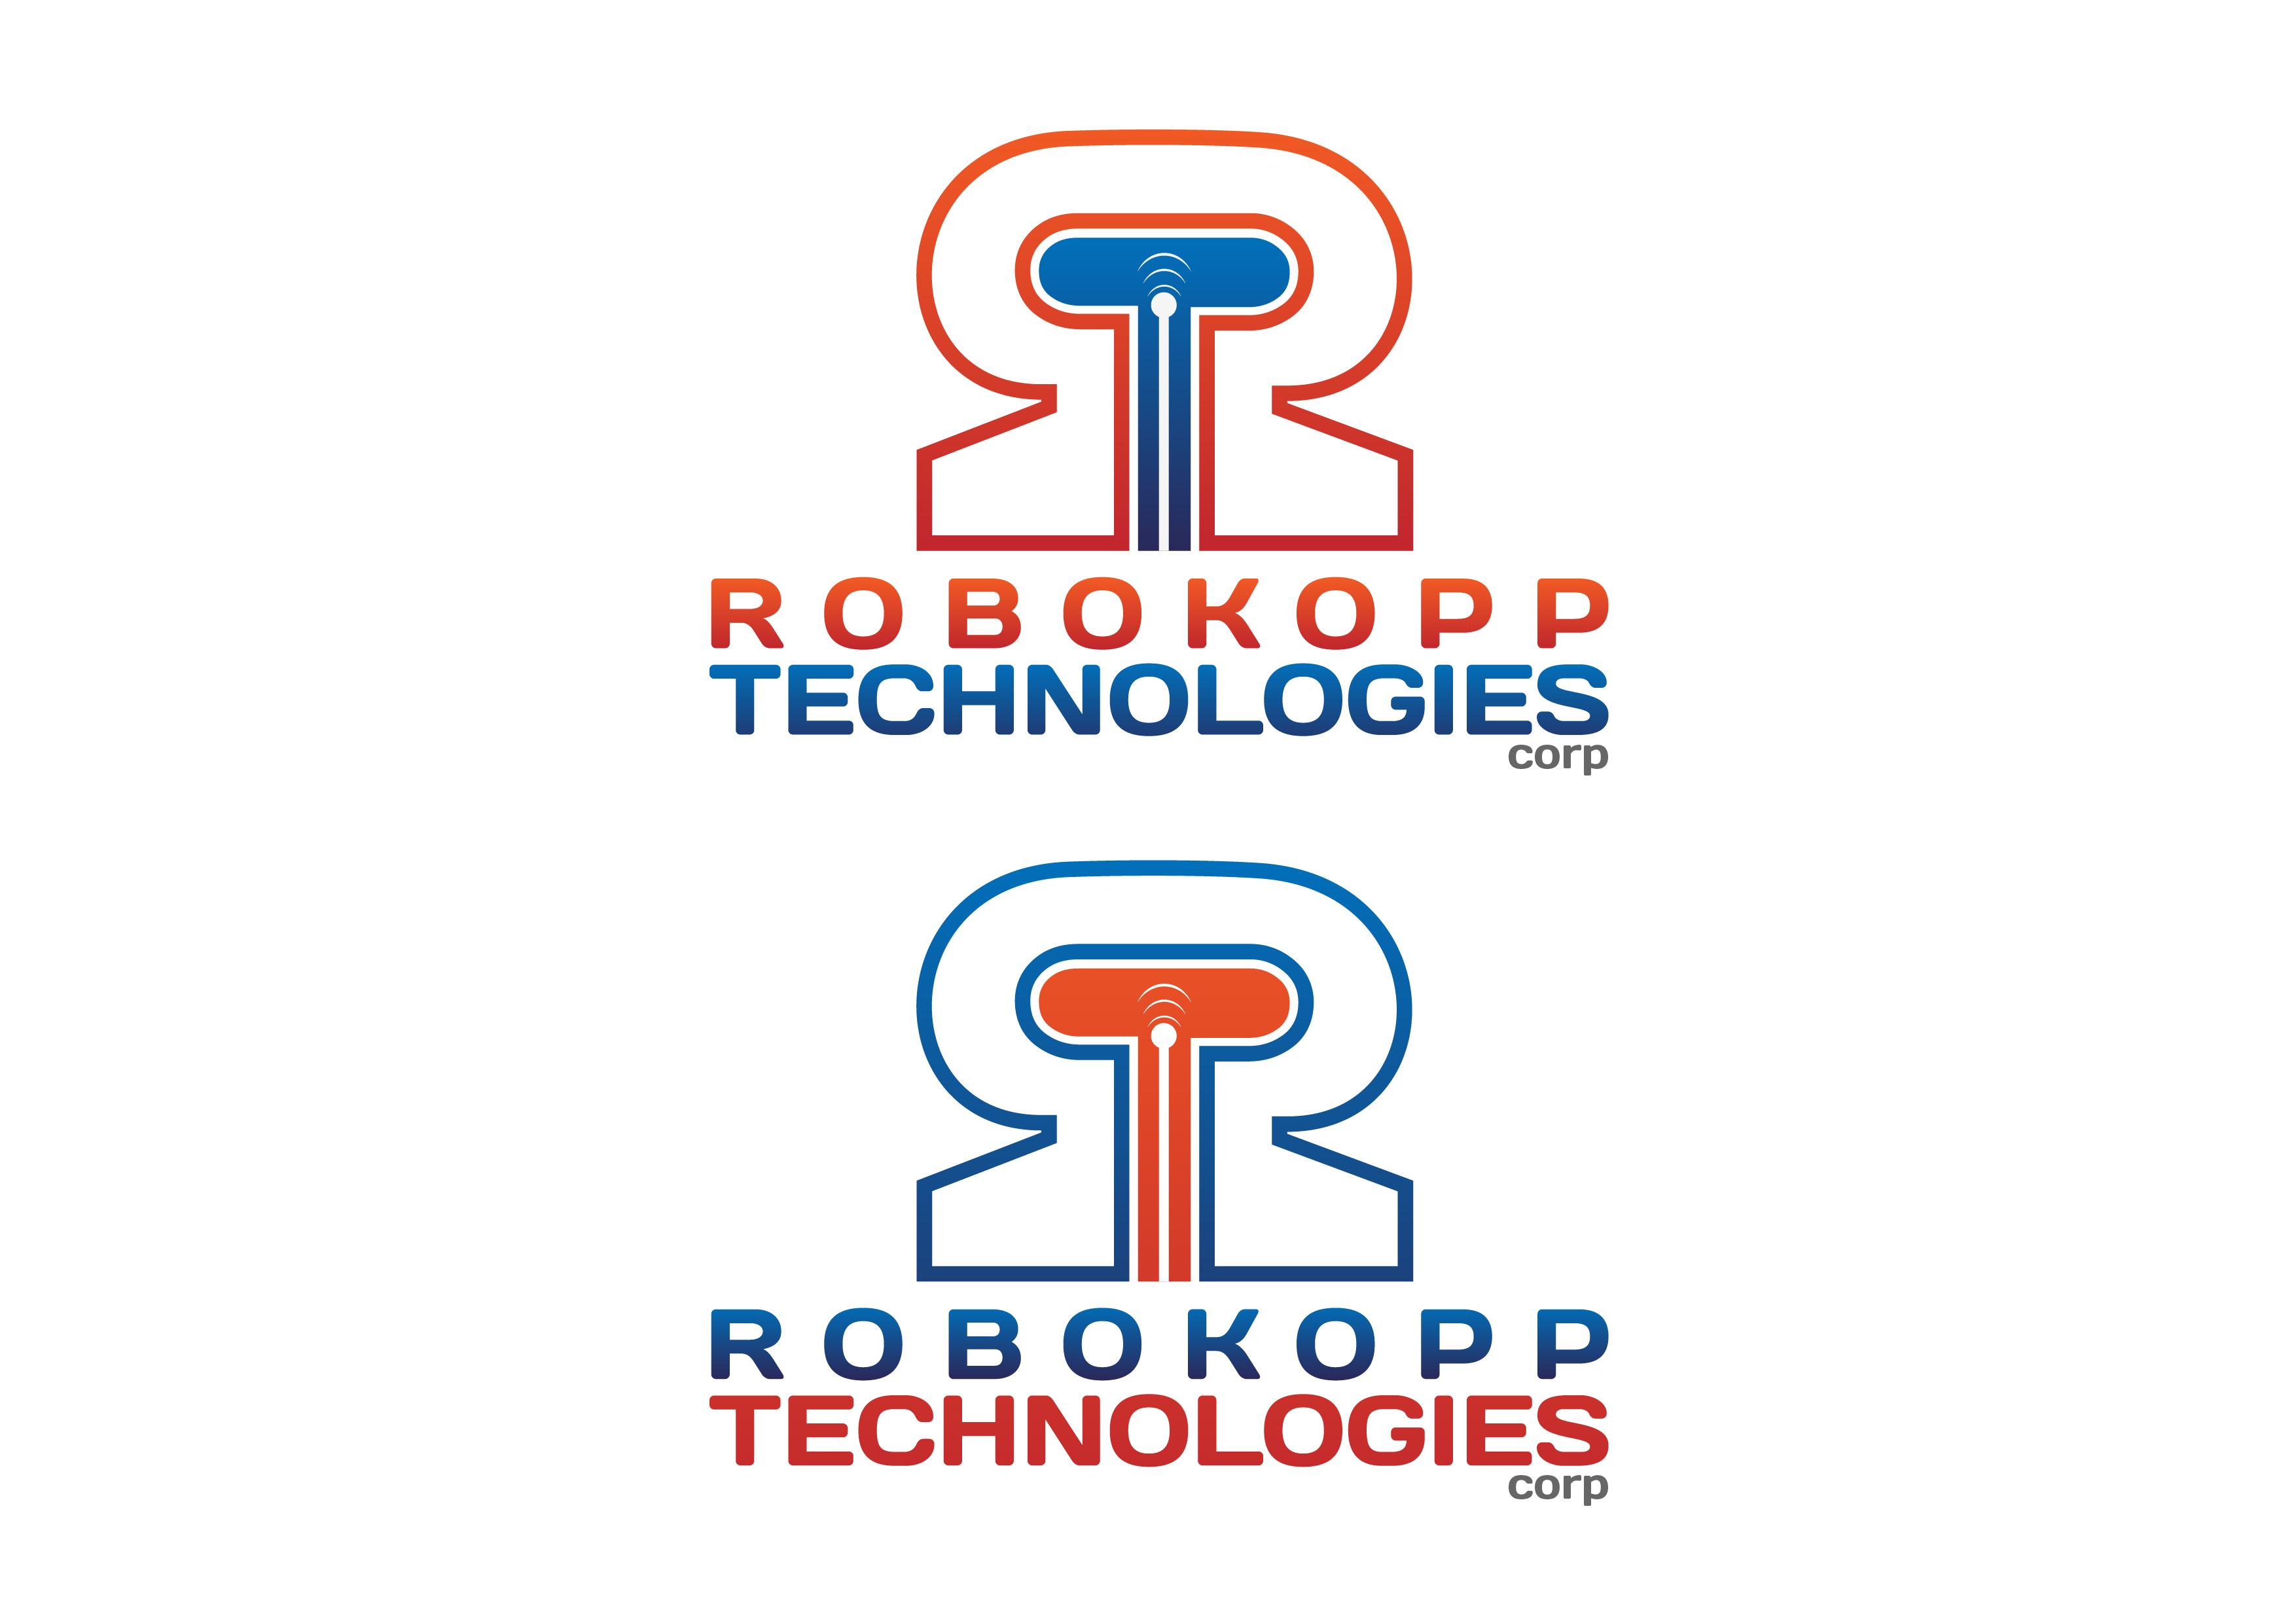 Logo Design by 3draw - Entry No. 42 in the Logo Design Contest New Logo Design for Robokopp Technologies Corp..